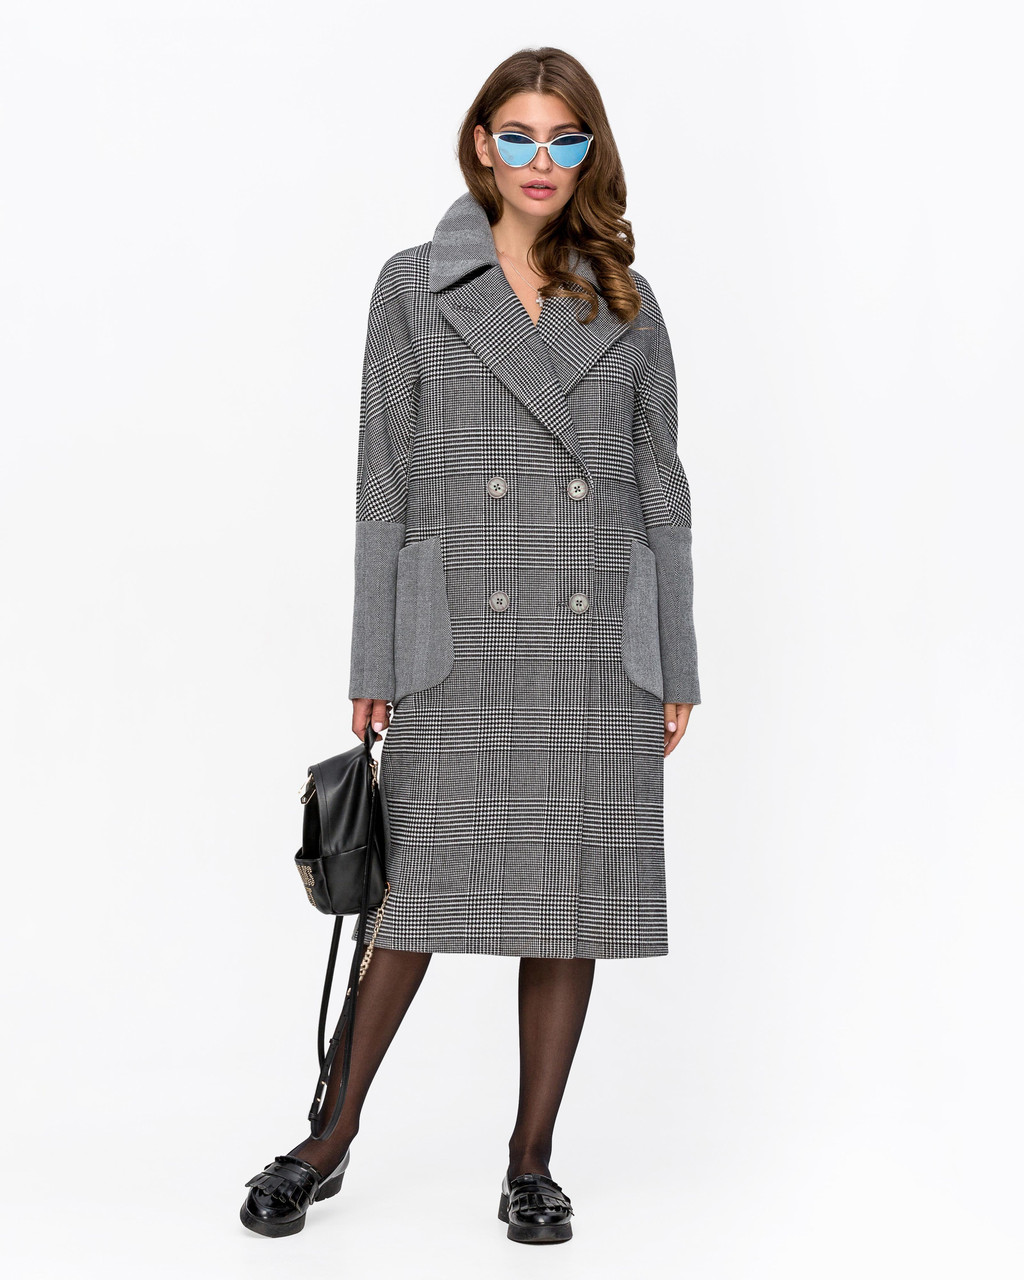 Пальто оверсайз в клетку с 42 по 50 размер